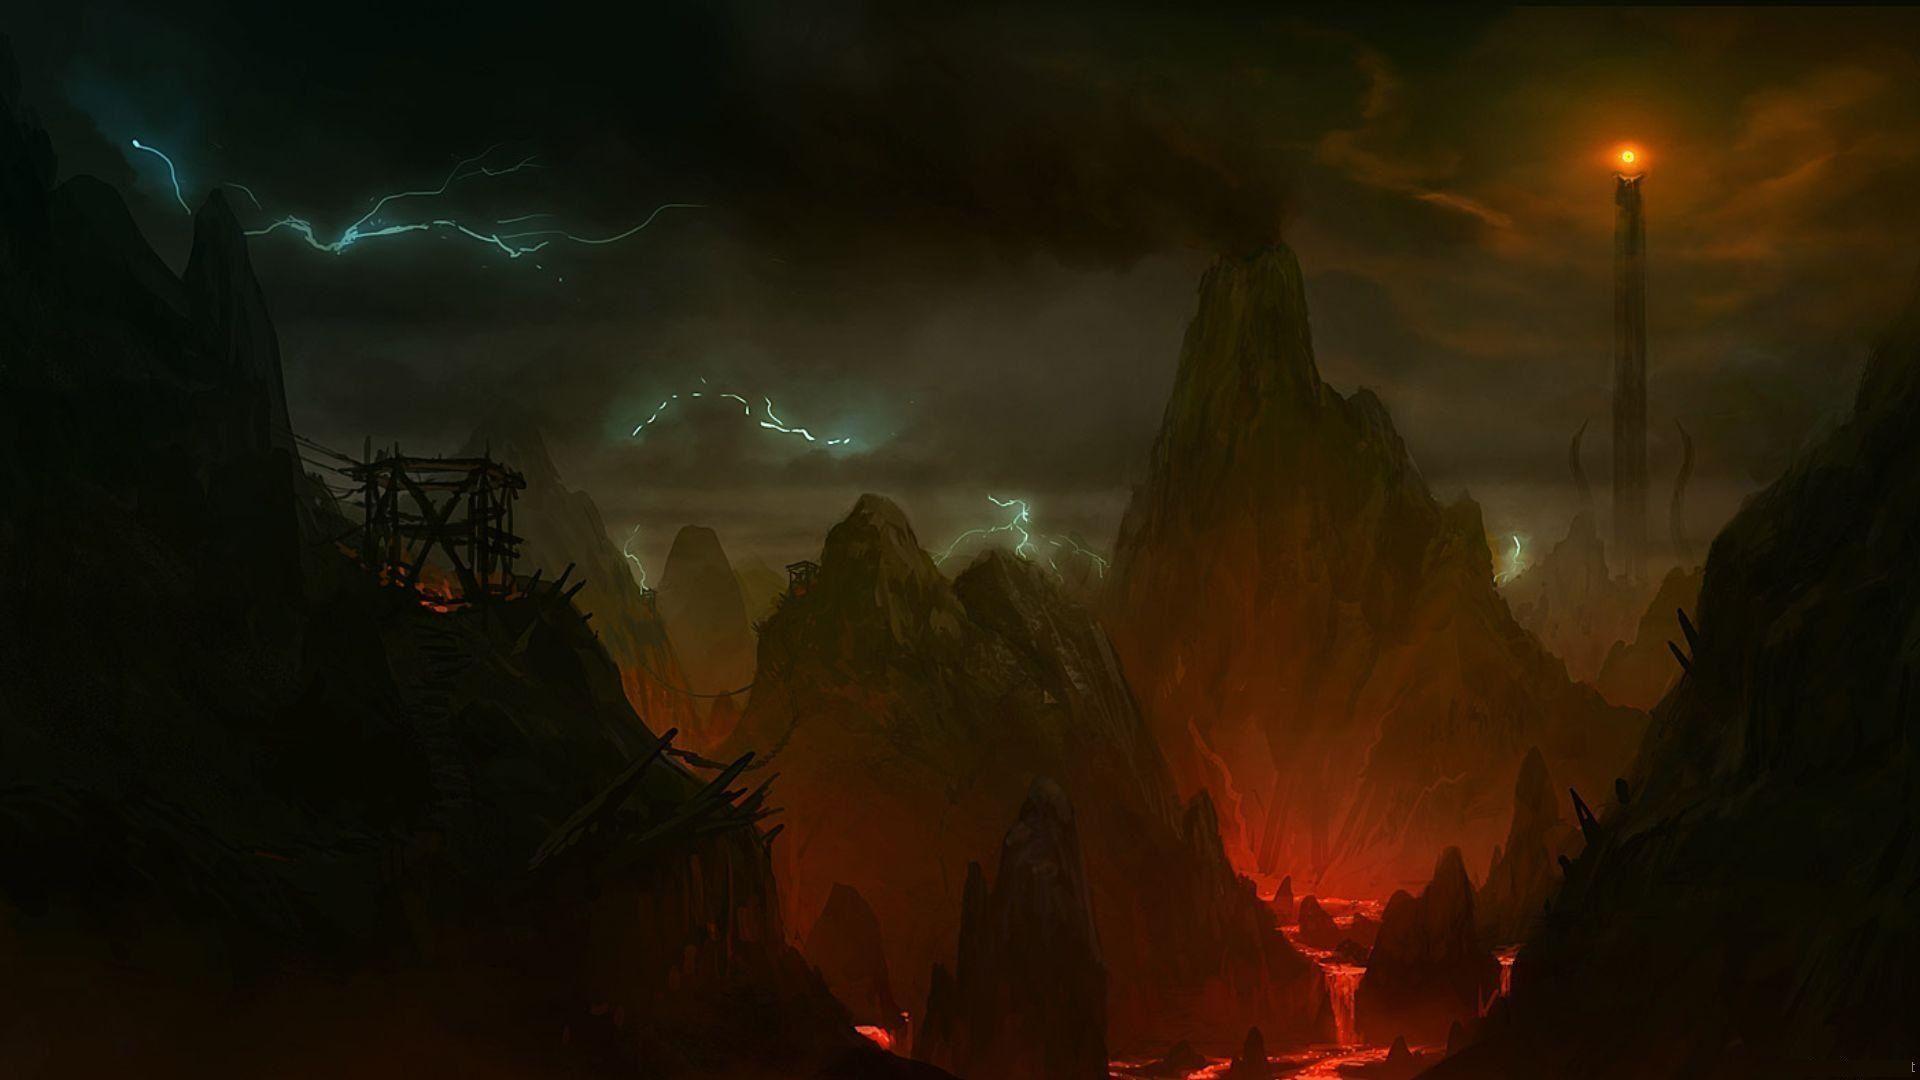 Lotr Mordor Wallpapers Top Free Lotr Mordor Backgrounds